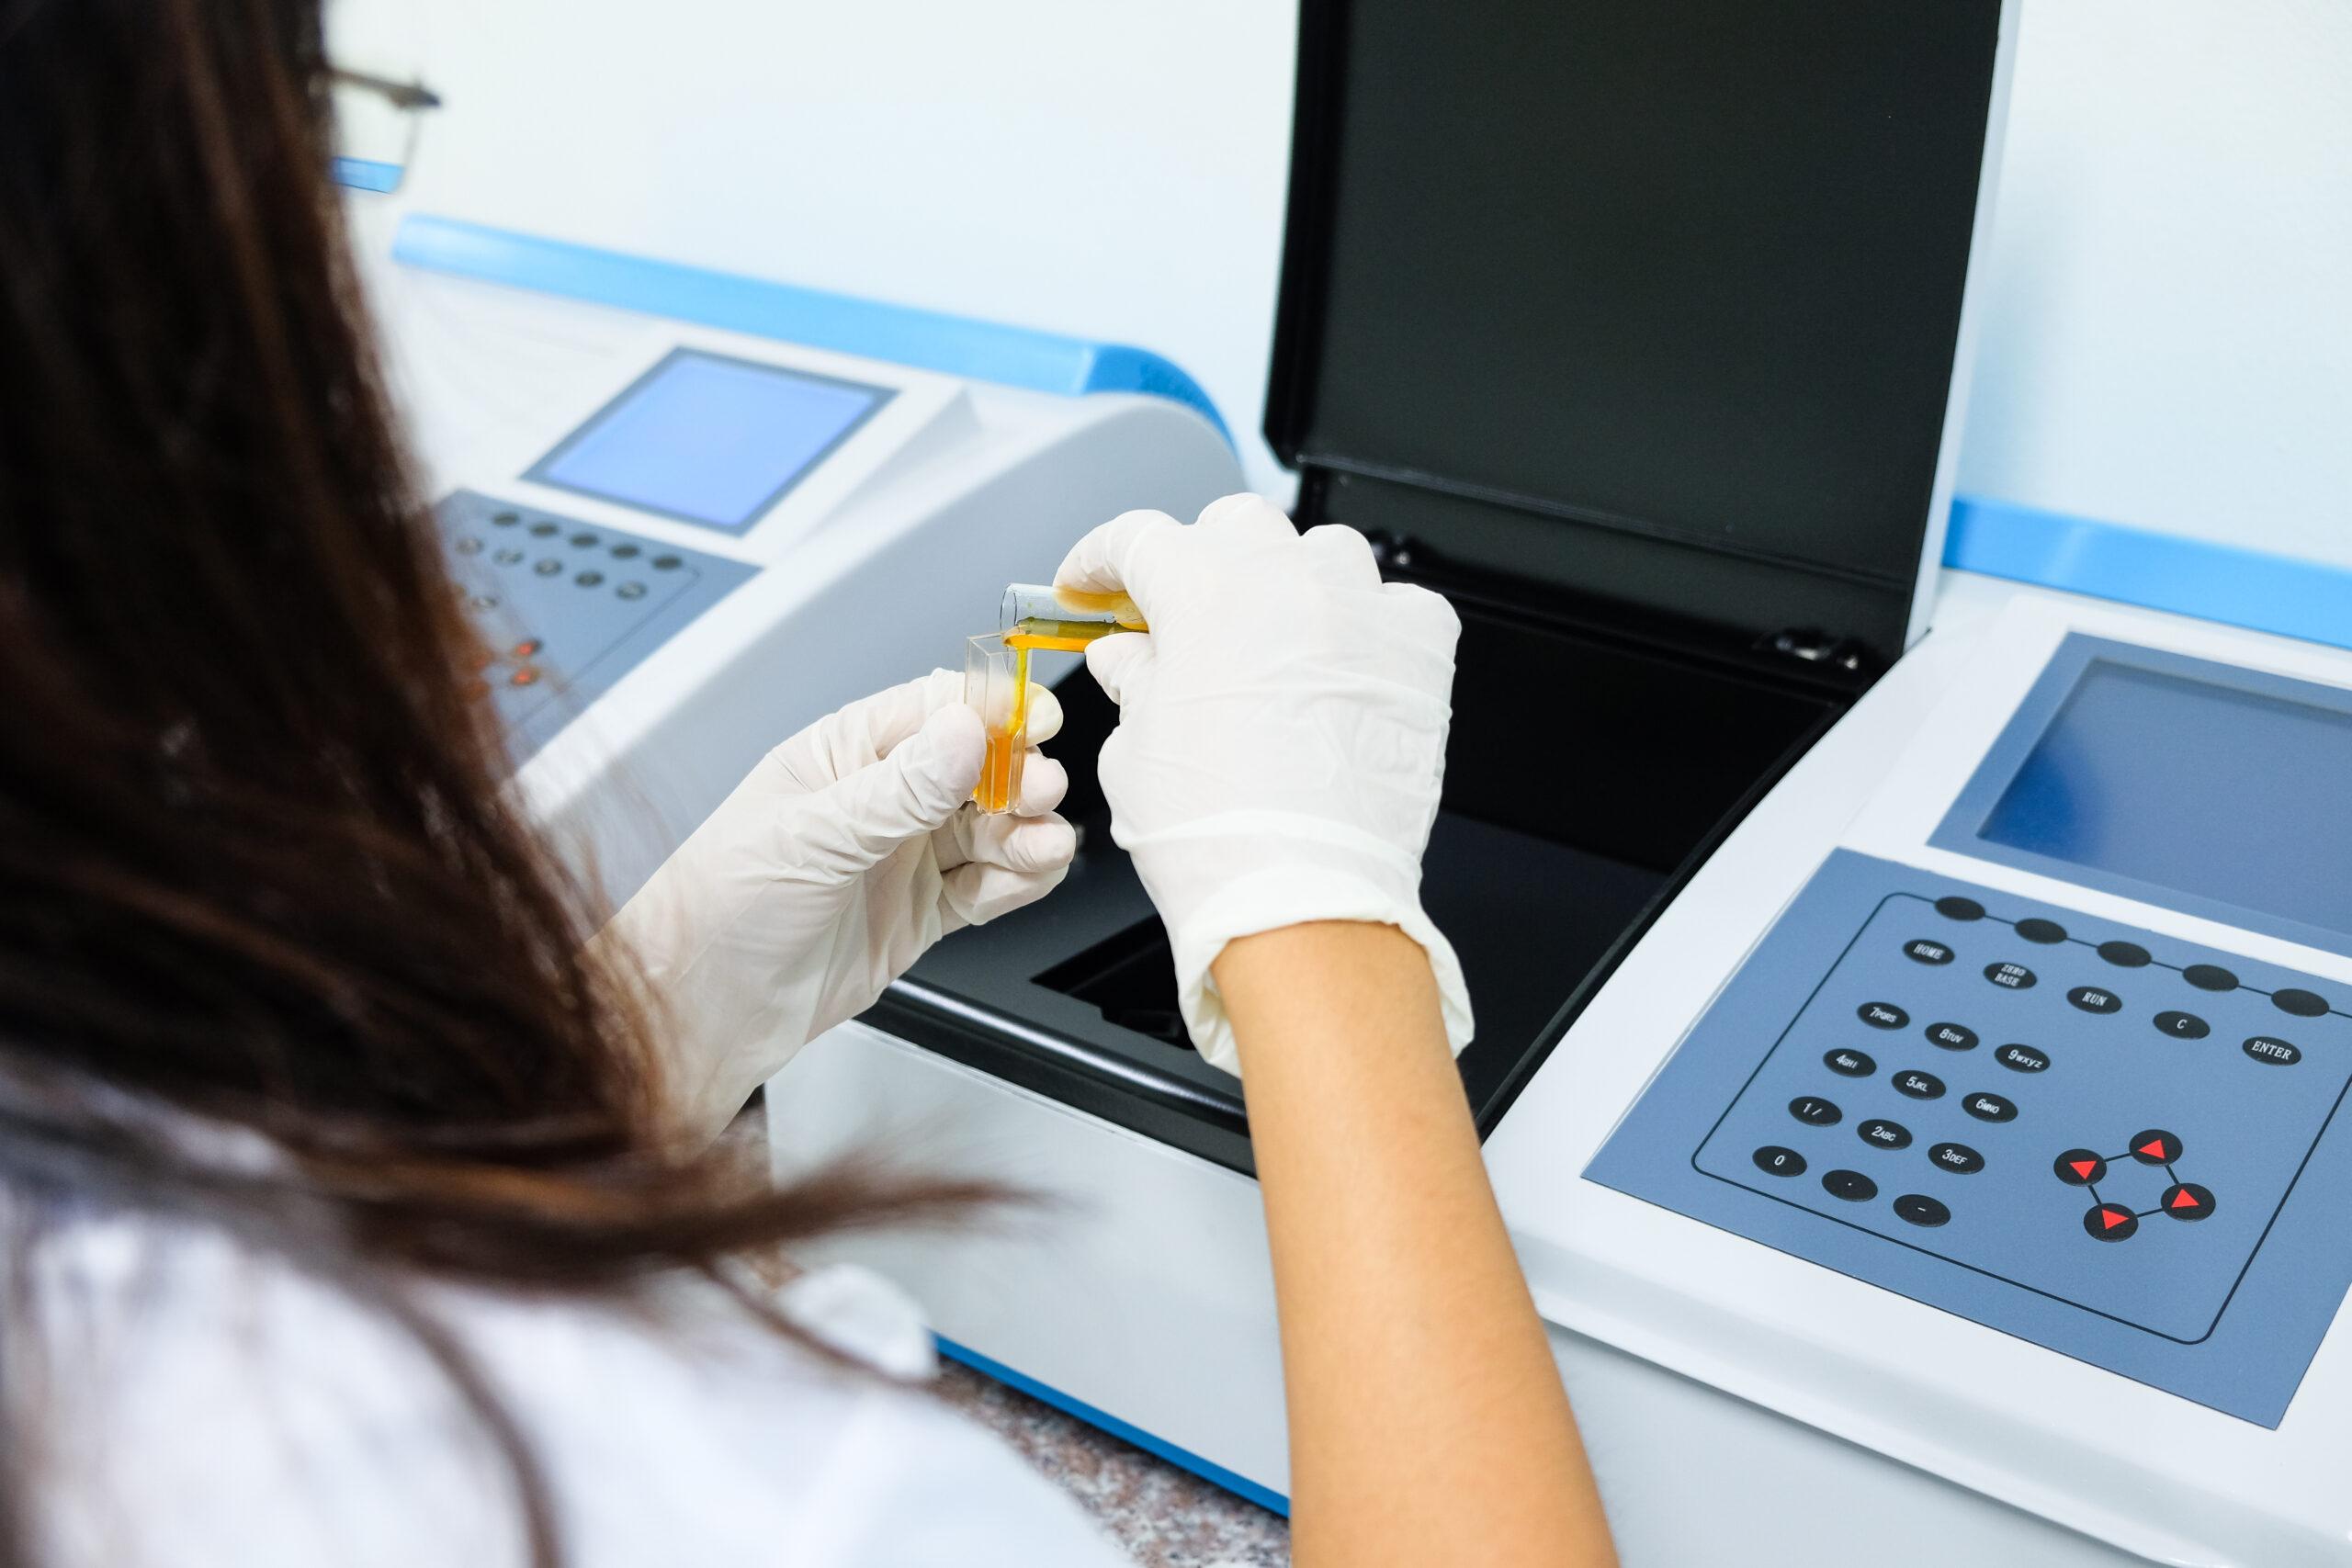 mikrolab ypiresies spectrometer analysis